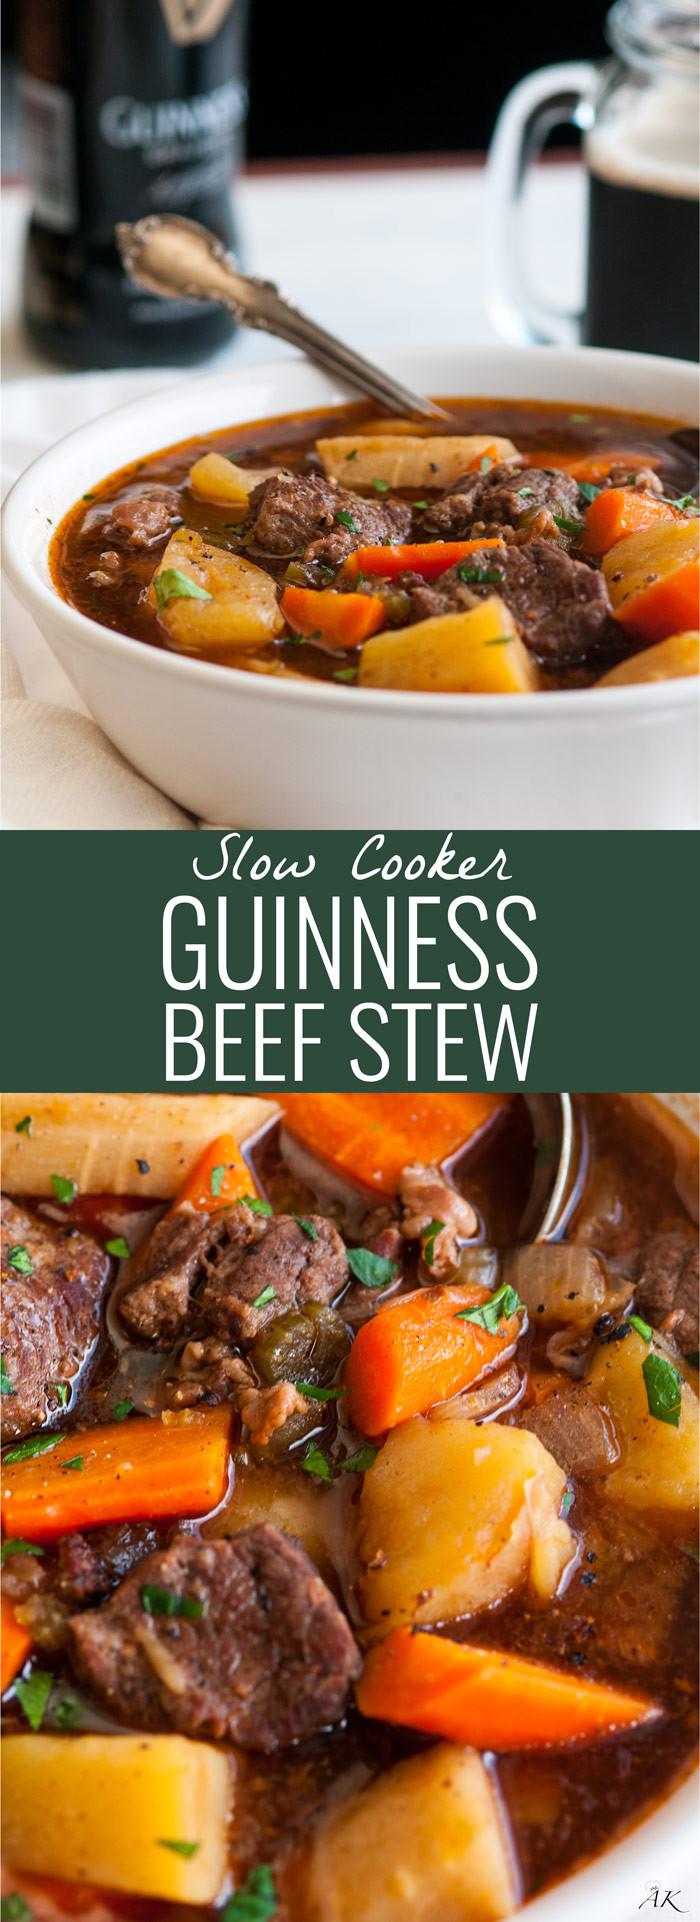 Irish Beef Stew Slow Cooker  Slow Cooker Guinness Beef Stew Aberdeen s Kitchen